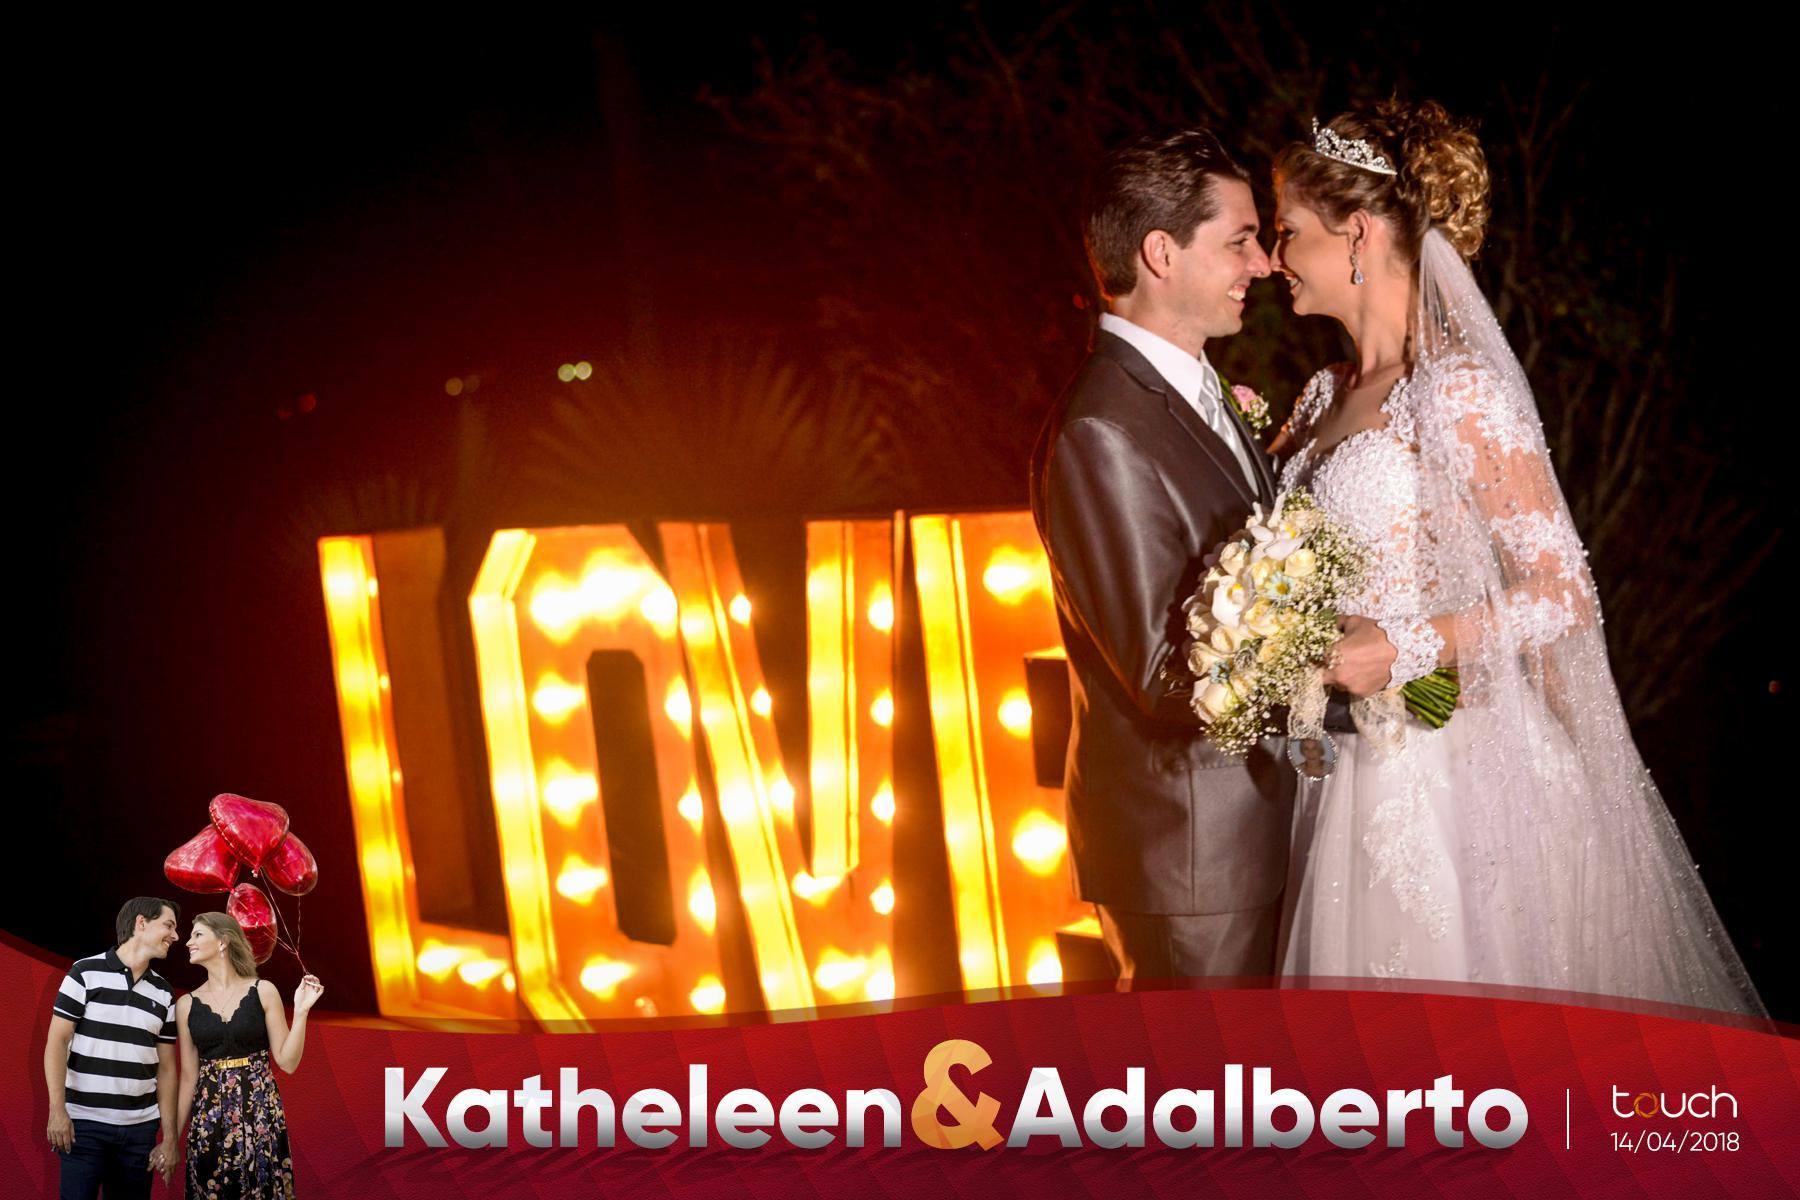 Katheleen e Adalberto